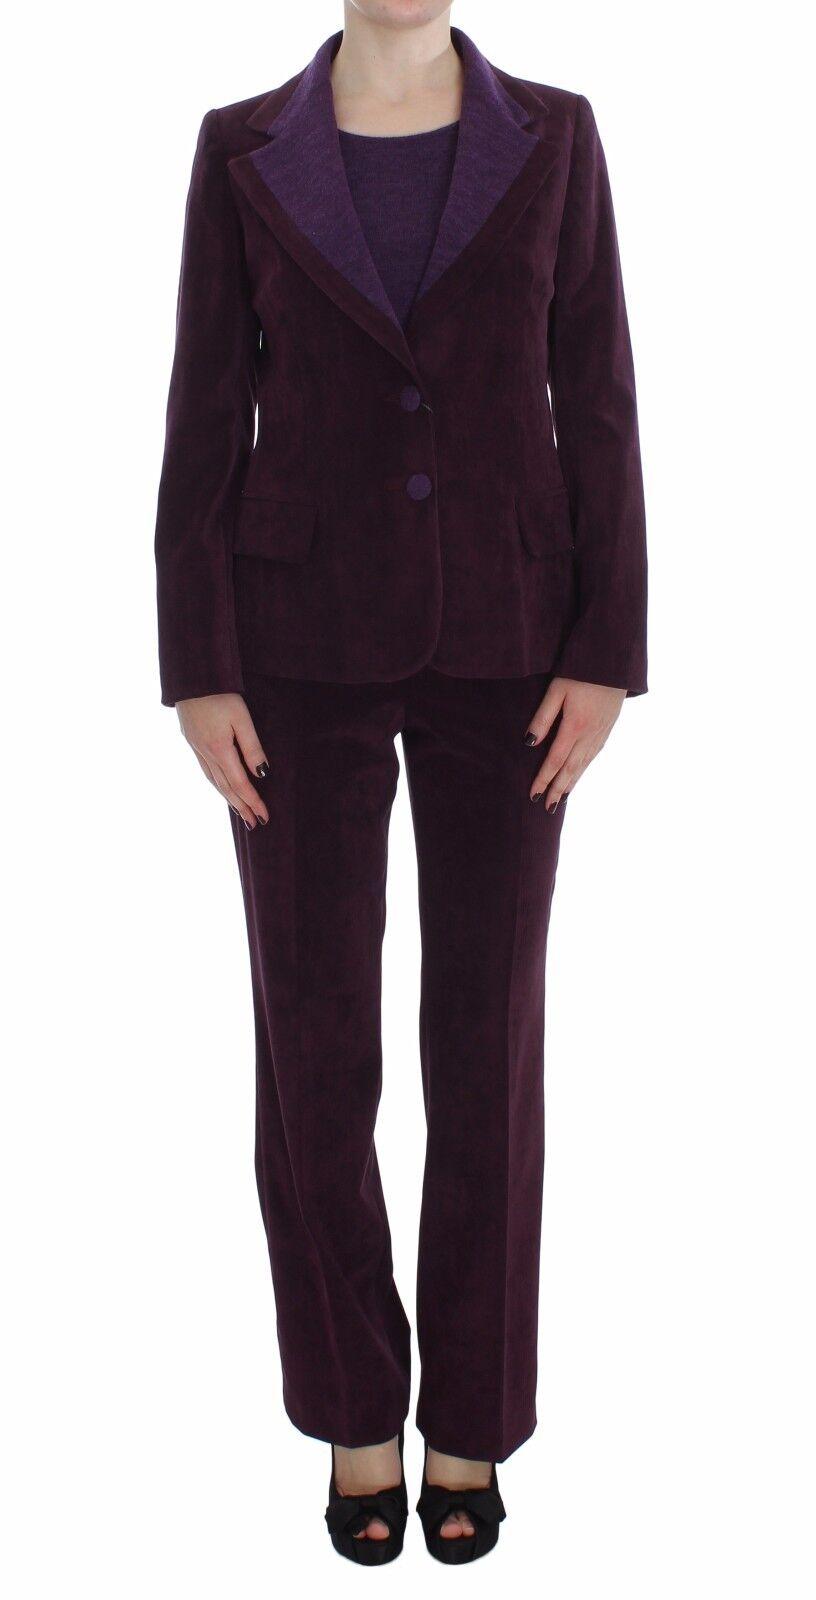 NEW BENCIVENGA Suit Blazer Pants Shirt Set Purple Wool s. IT42   US8   M